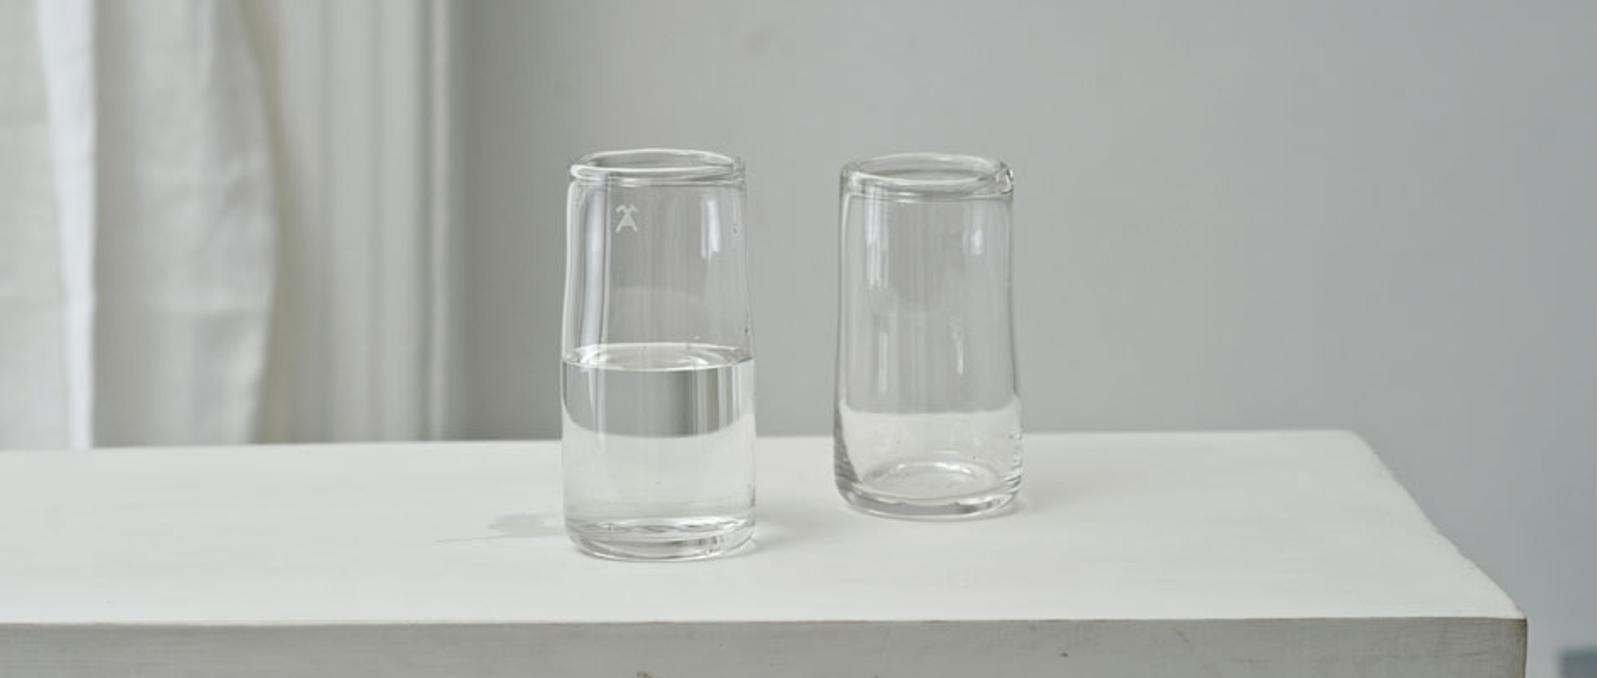 RIIJA-glass